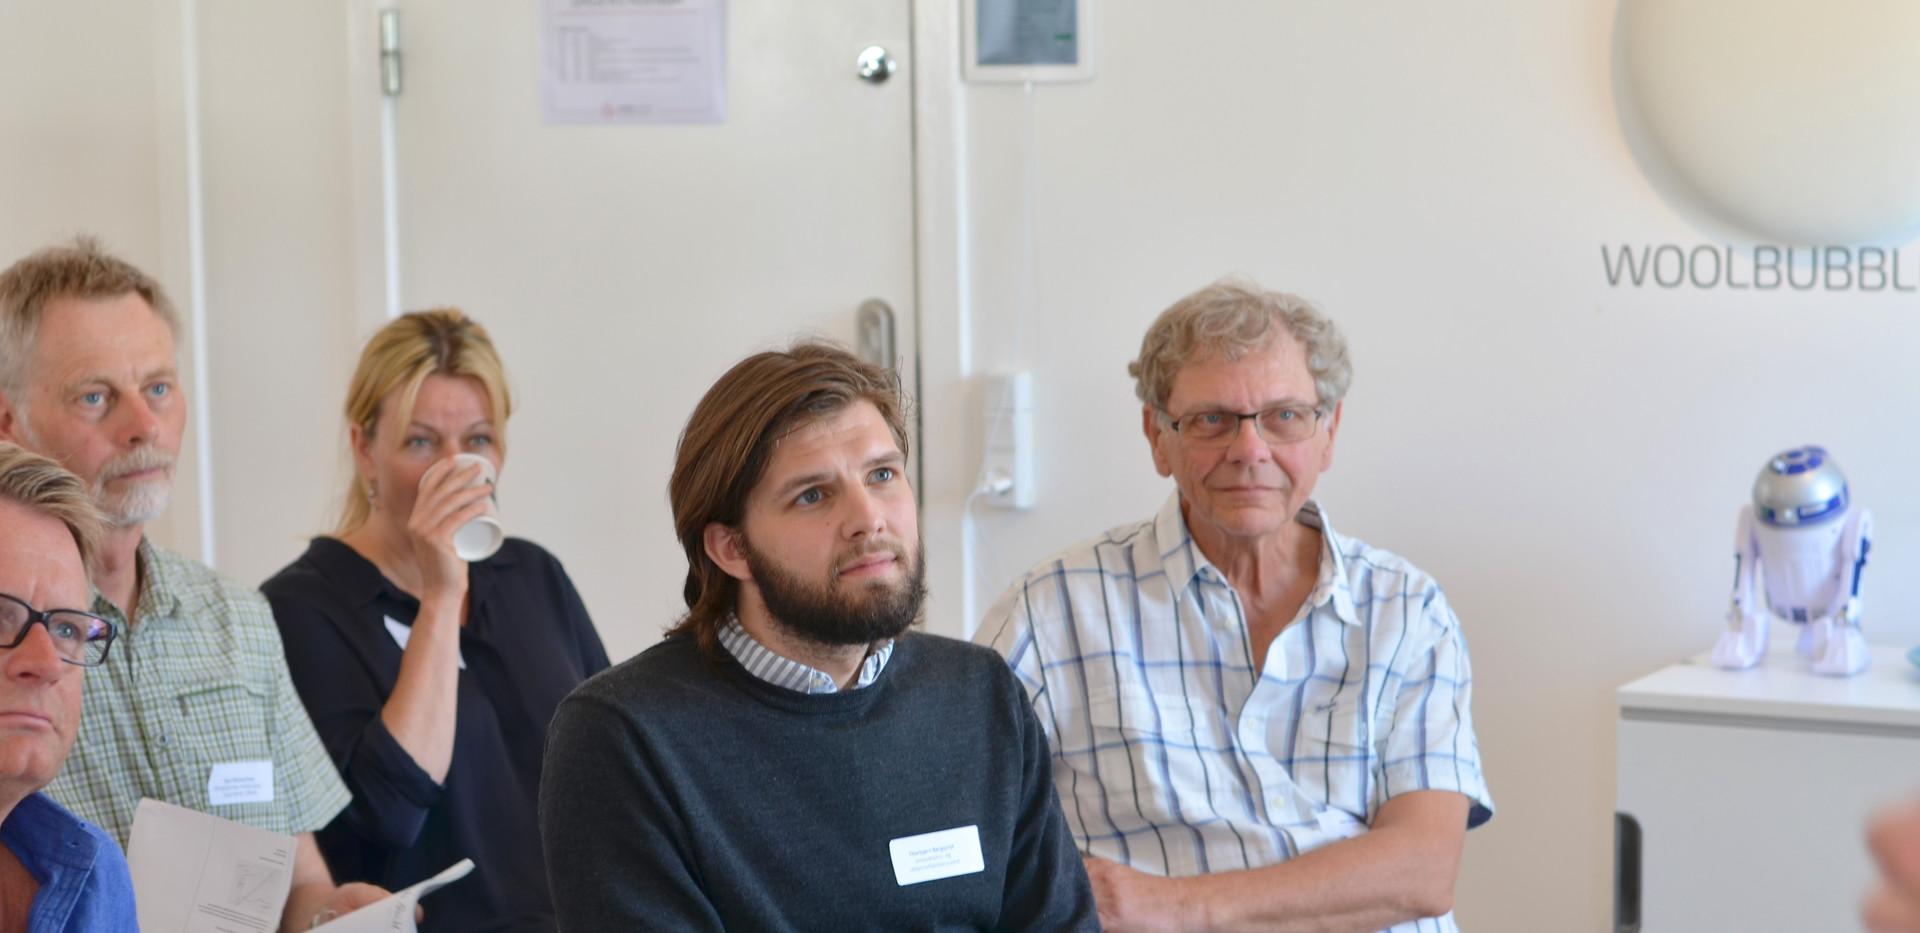 4. Seminar i støj- og arbejdsmiljø